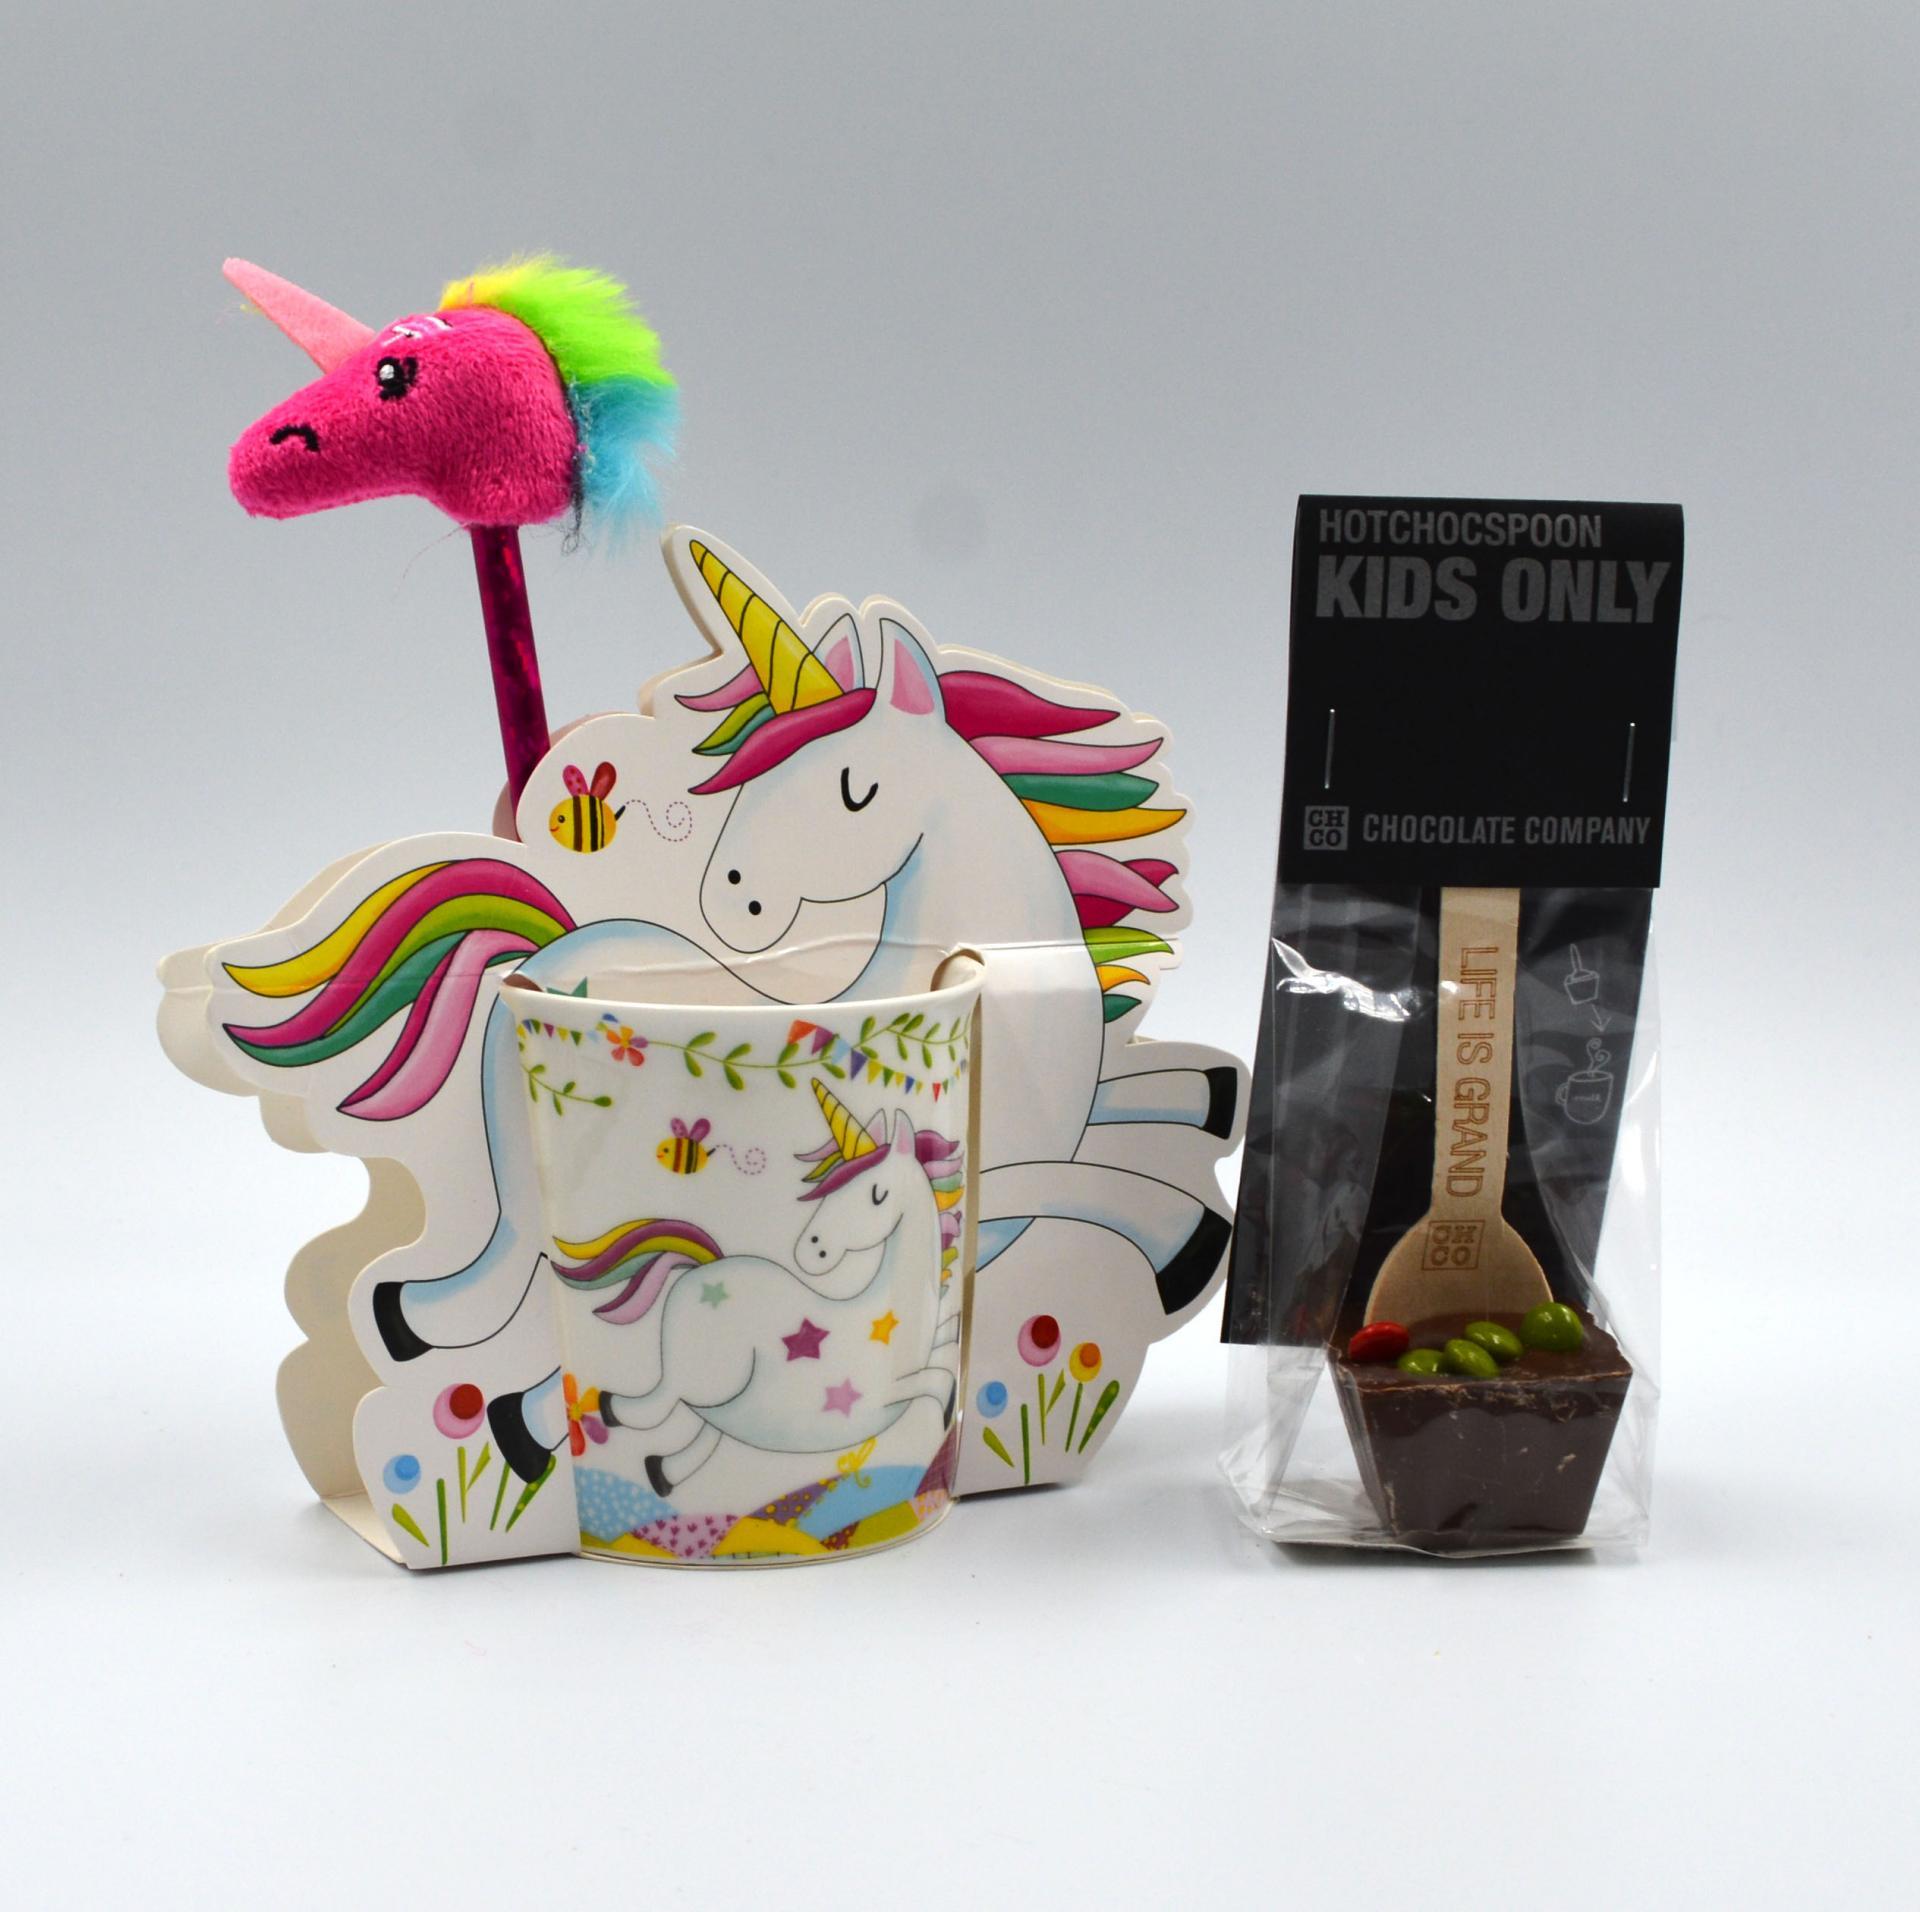 Taza Unicornio con cuchara de Chocolate y lápiz Unicornio